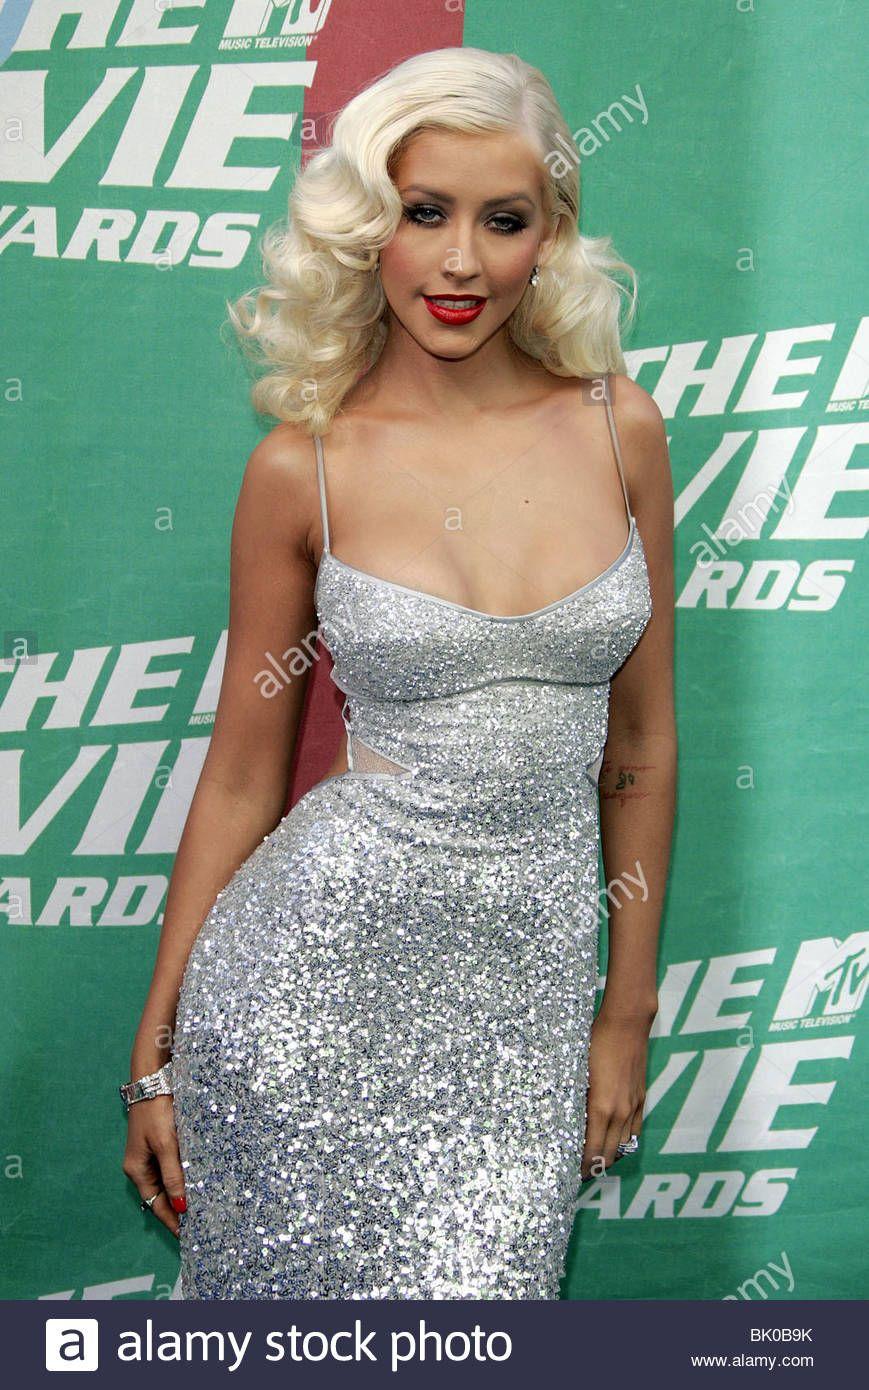 Sideboobs Christina Aguilera nudes (87 photos), Topless, Hot, Selfie, in bikini 2017